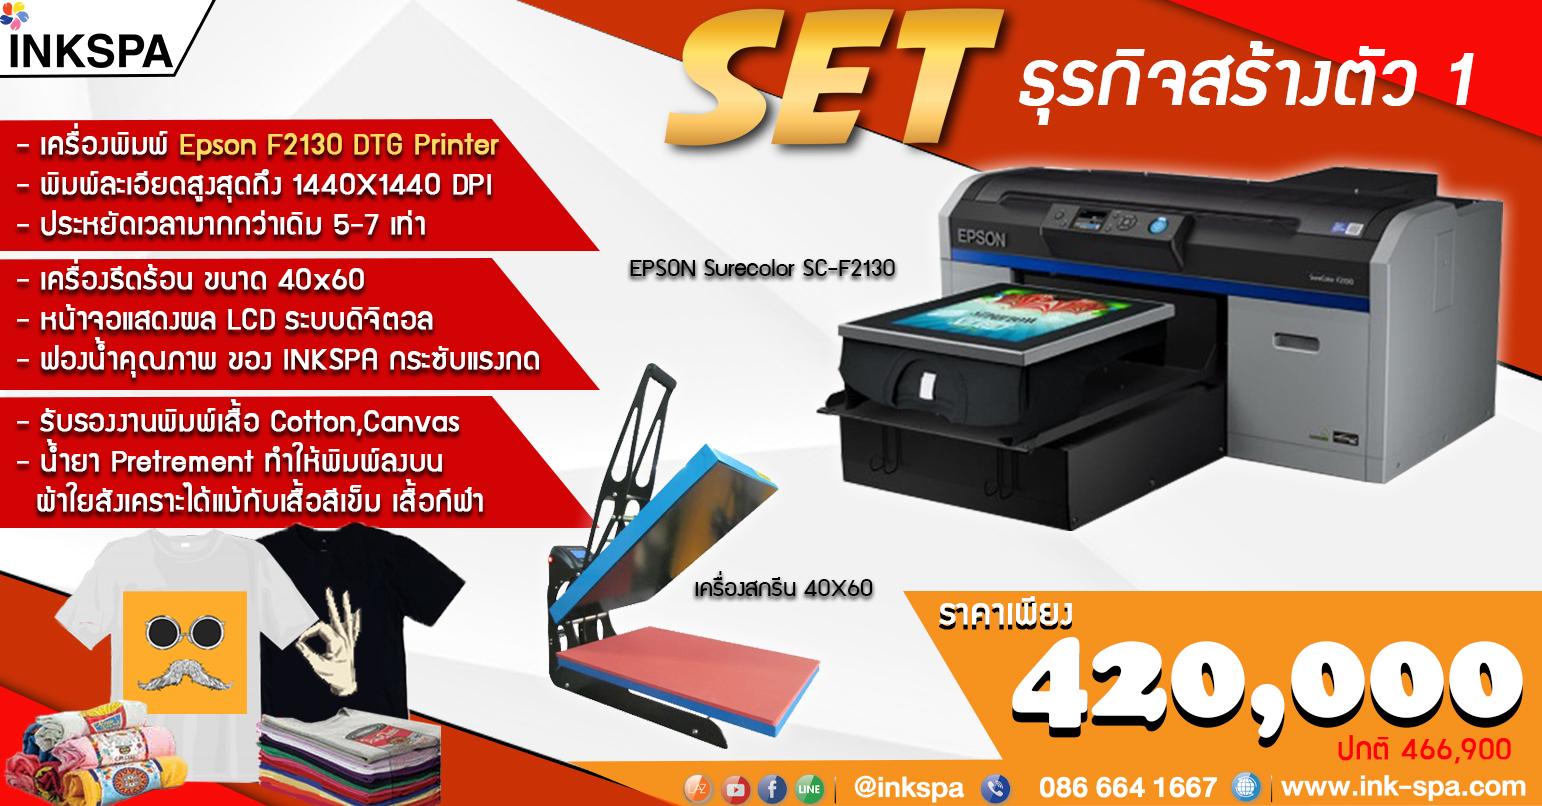 Epson F2130, เครื่องพิมพ์ DTG, เครื่องพิมพ์เสื้อ, DTG Printer, เครื่องสกรีน, เครื่องรีด, Heat Transfer, เครื่องพิมพ์เสื้อ dtg เครื่องพิมพ์dtg